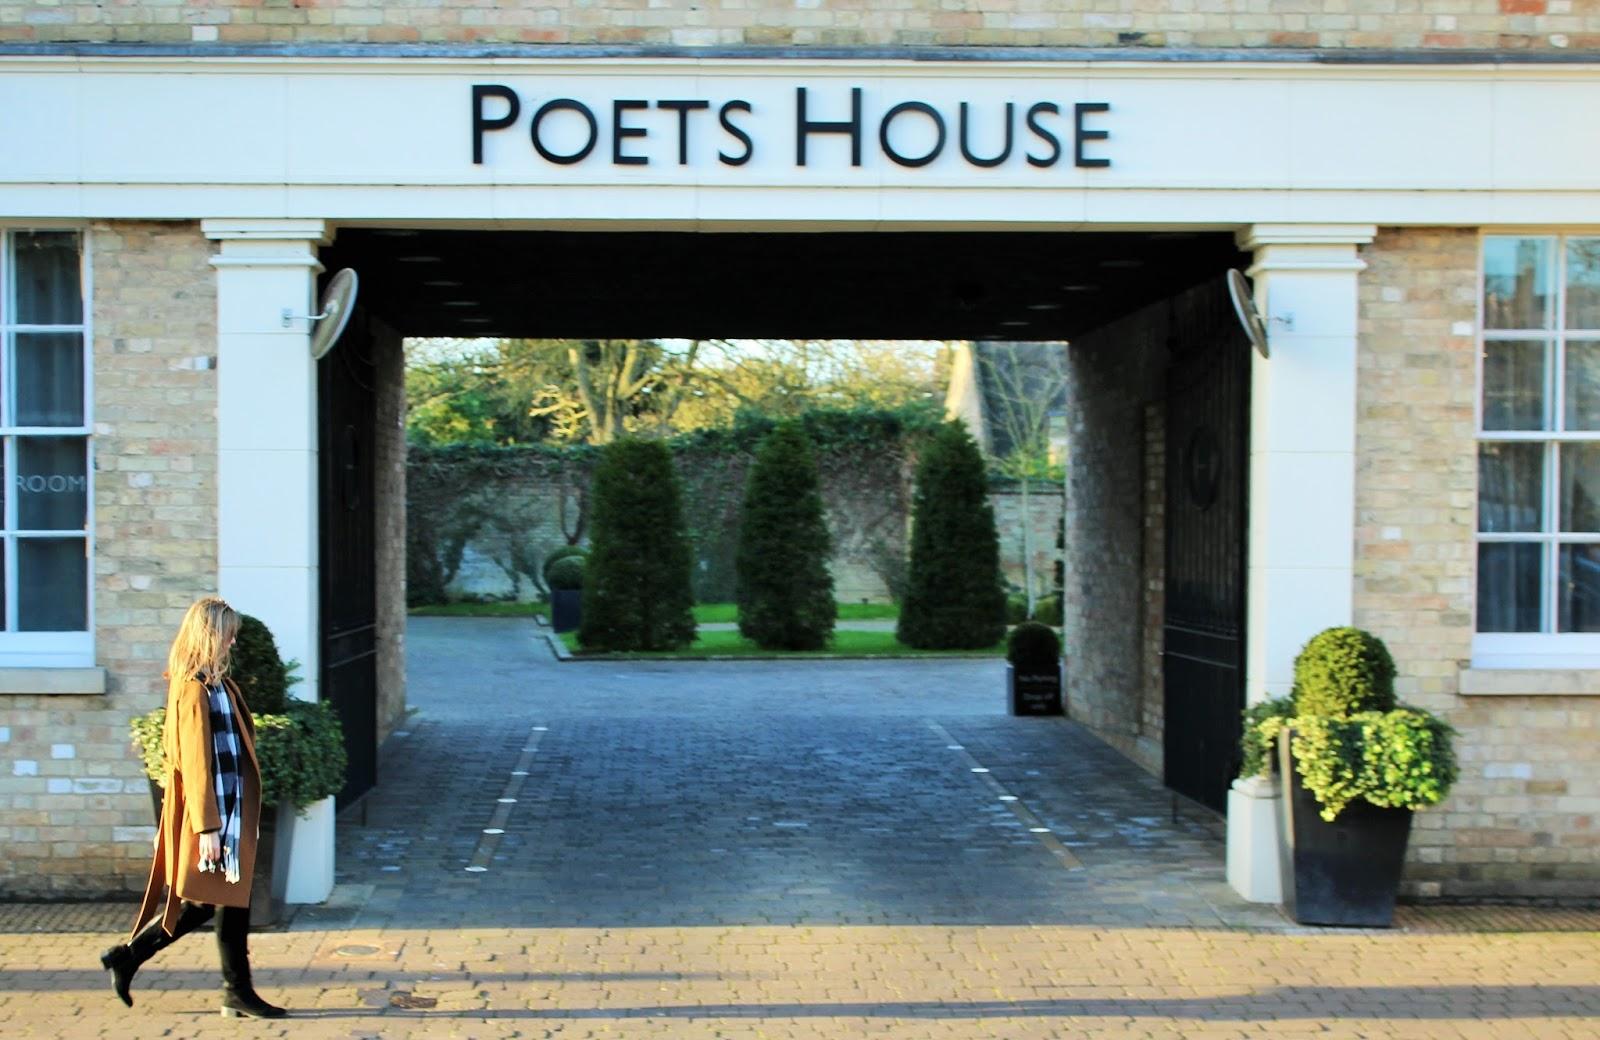 Poets House Hotel, Ely, Cambridgeshire